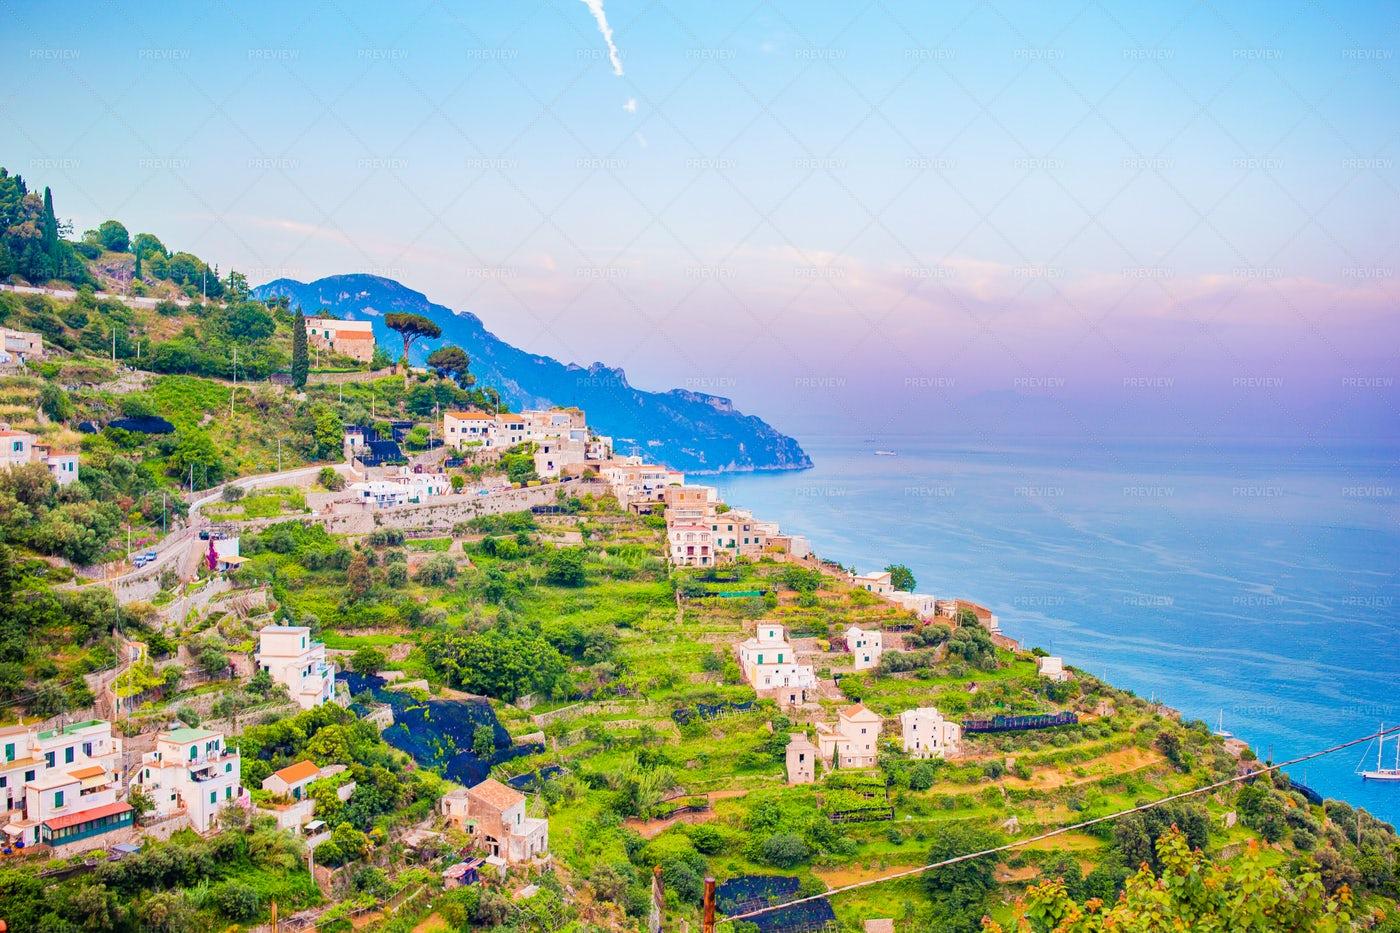 Positano, Amalfi Coast: Stock Photos